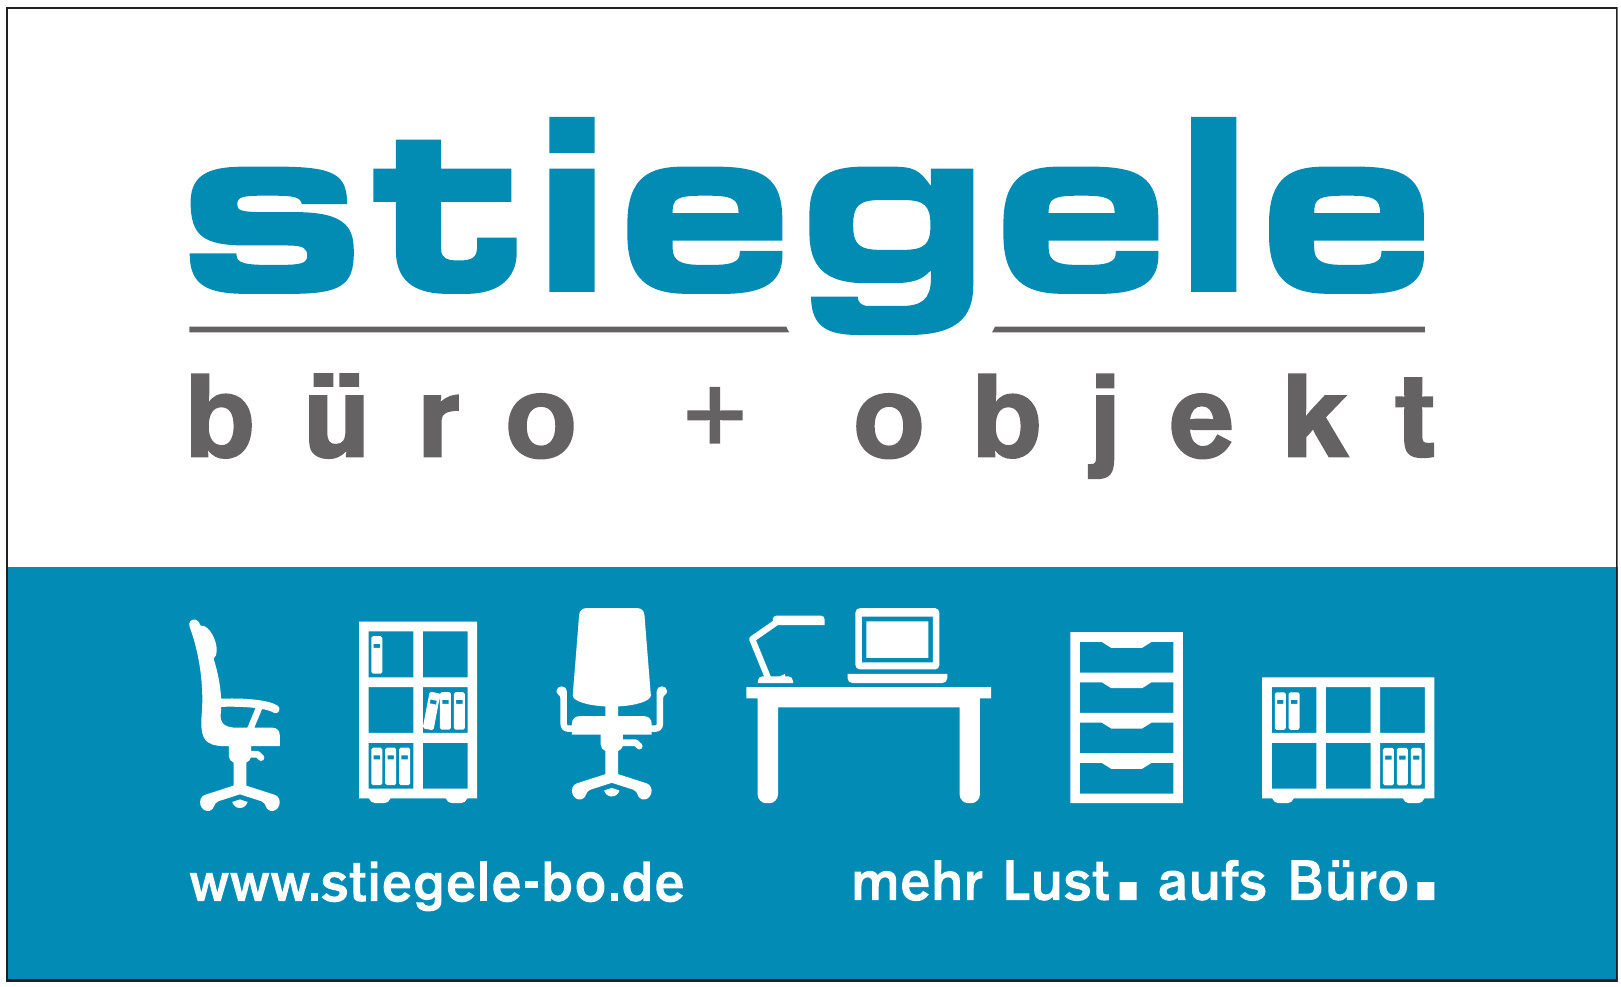 Stiegele Büro + Objekt